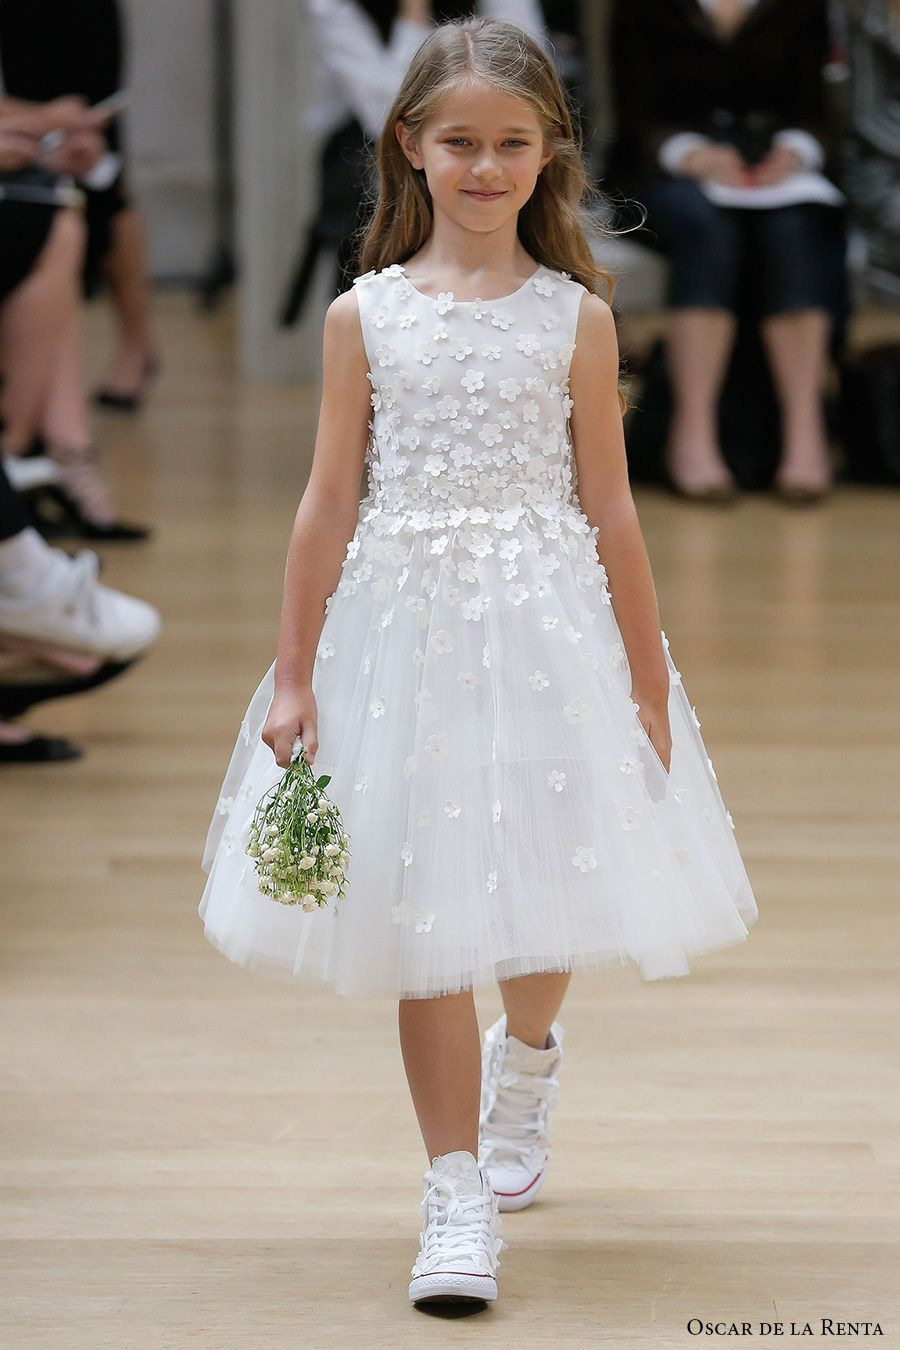 Oscar de la Renta Spring 2018 Wedding Dresses — New York